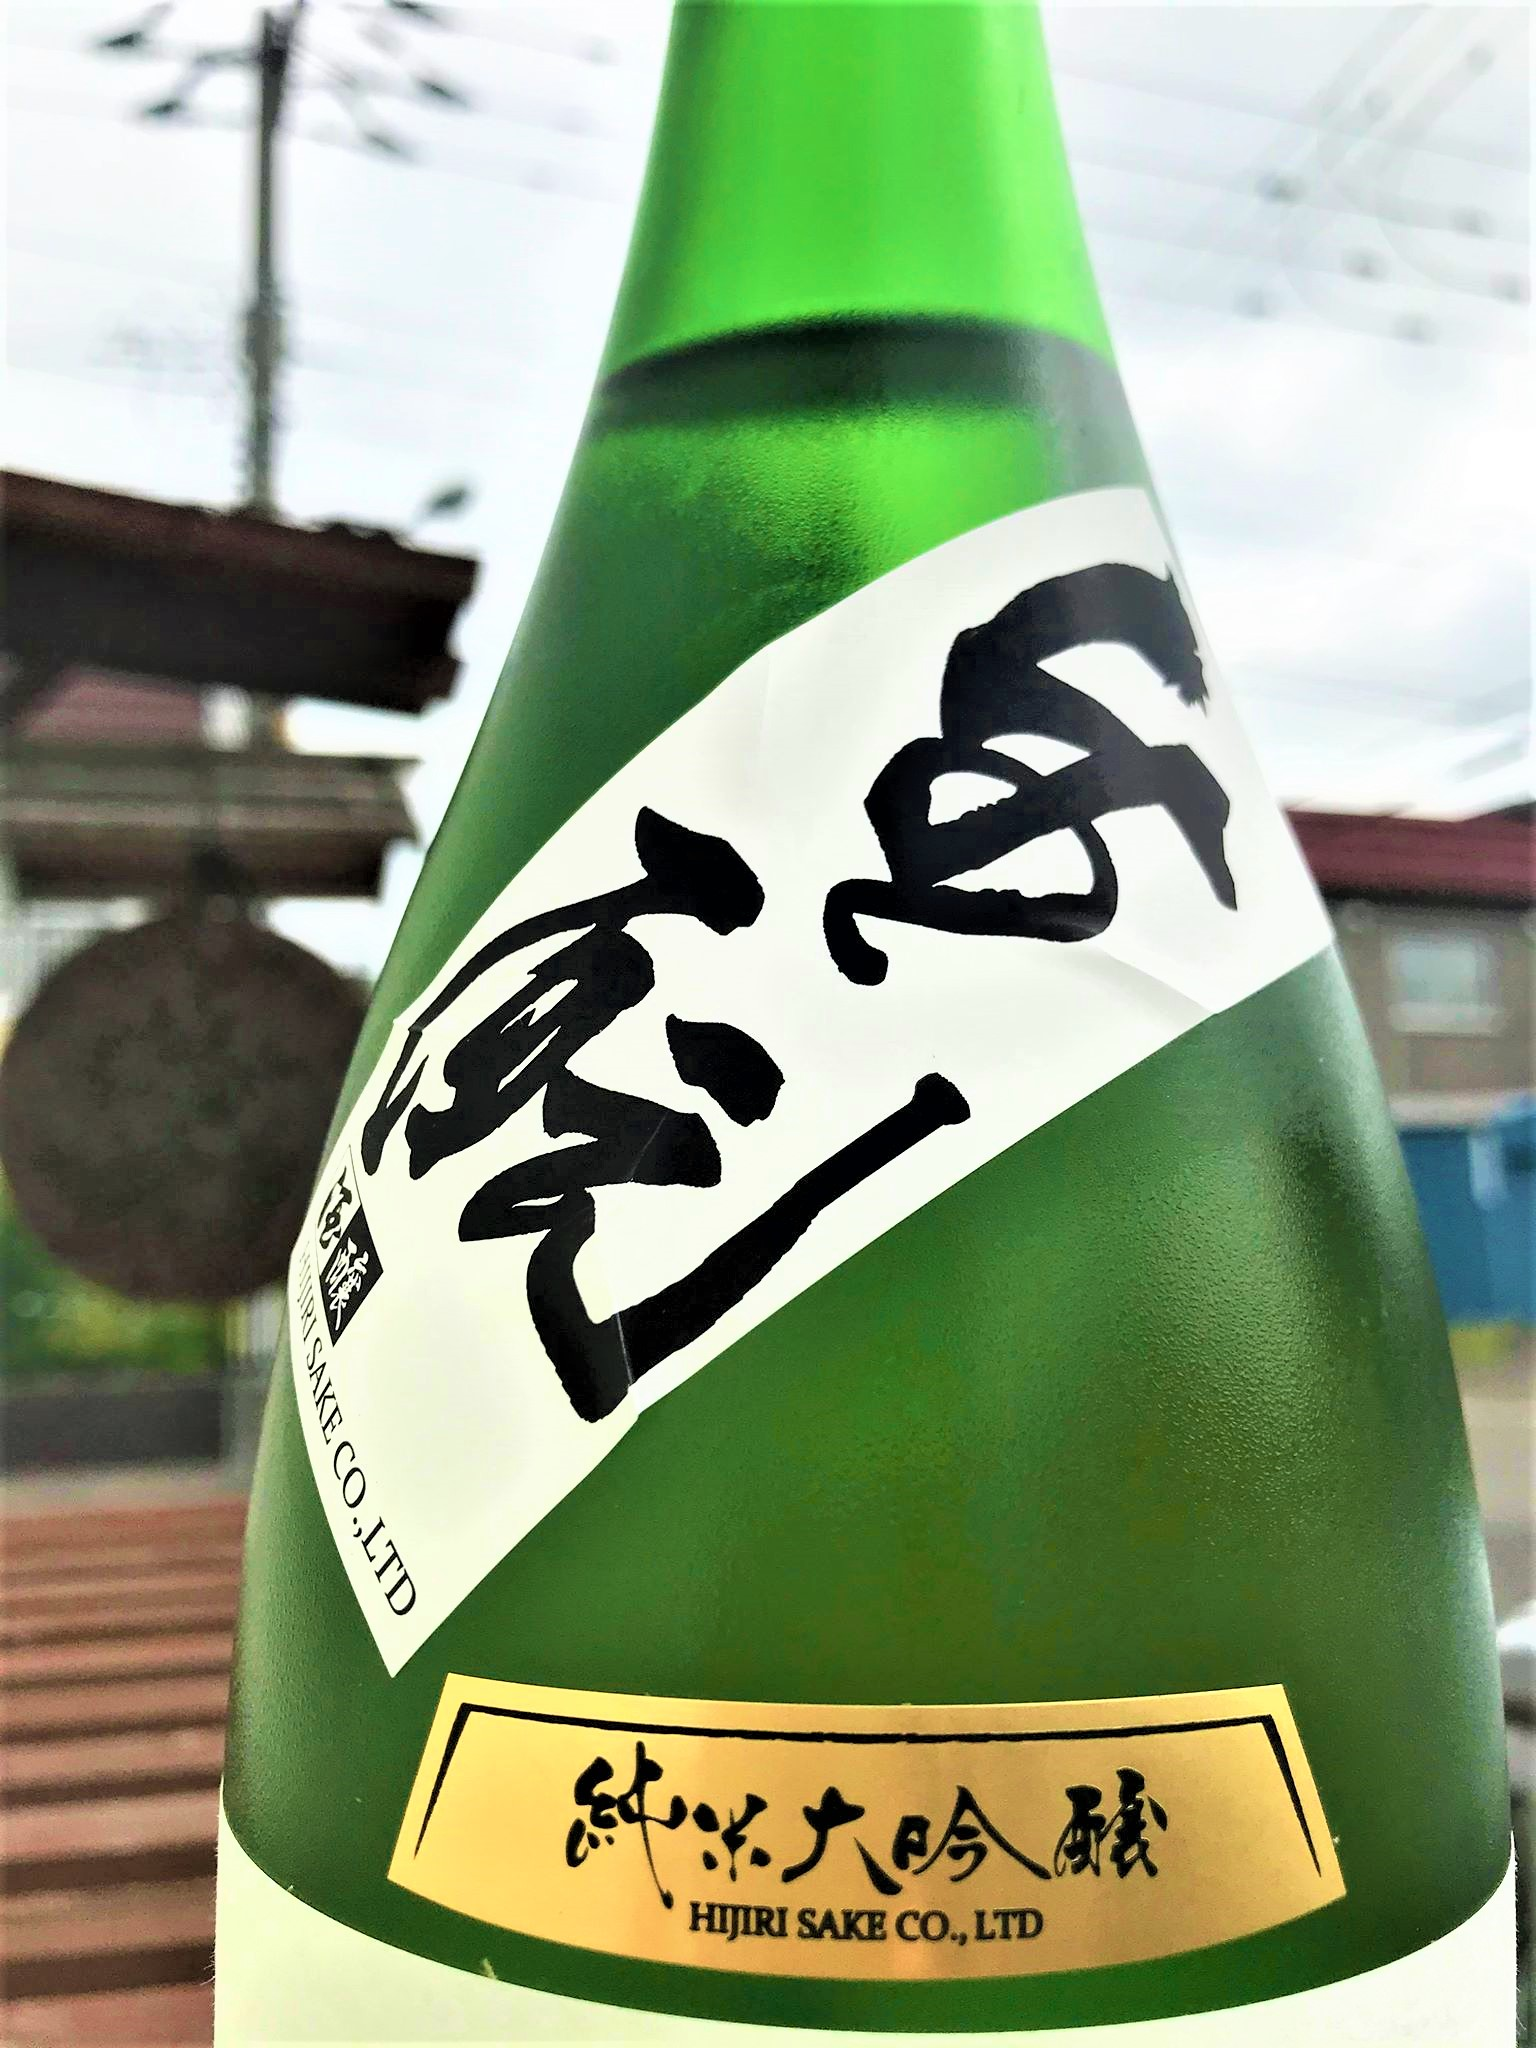 【日本酒】聖⭐特別編『Savege』生酛造り 純米大吟醸酒 The White Label 特別限定蔵出し 令和1BY🆕_e0173738_10205047.jpg